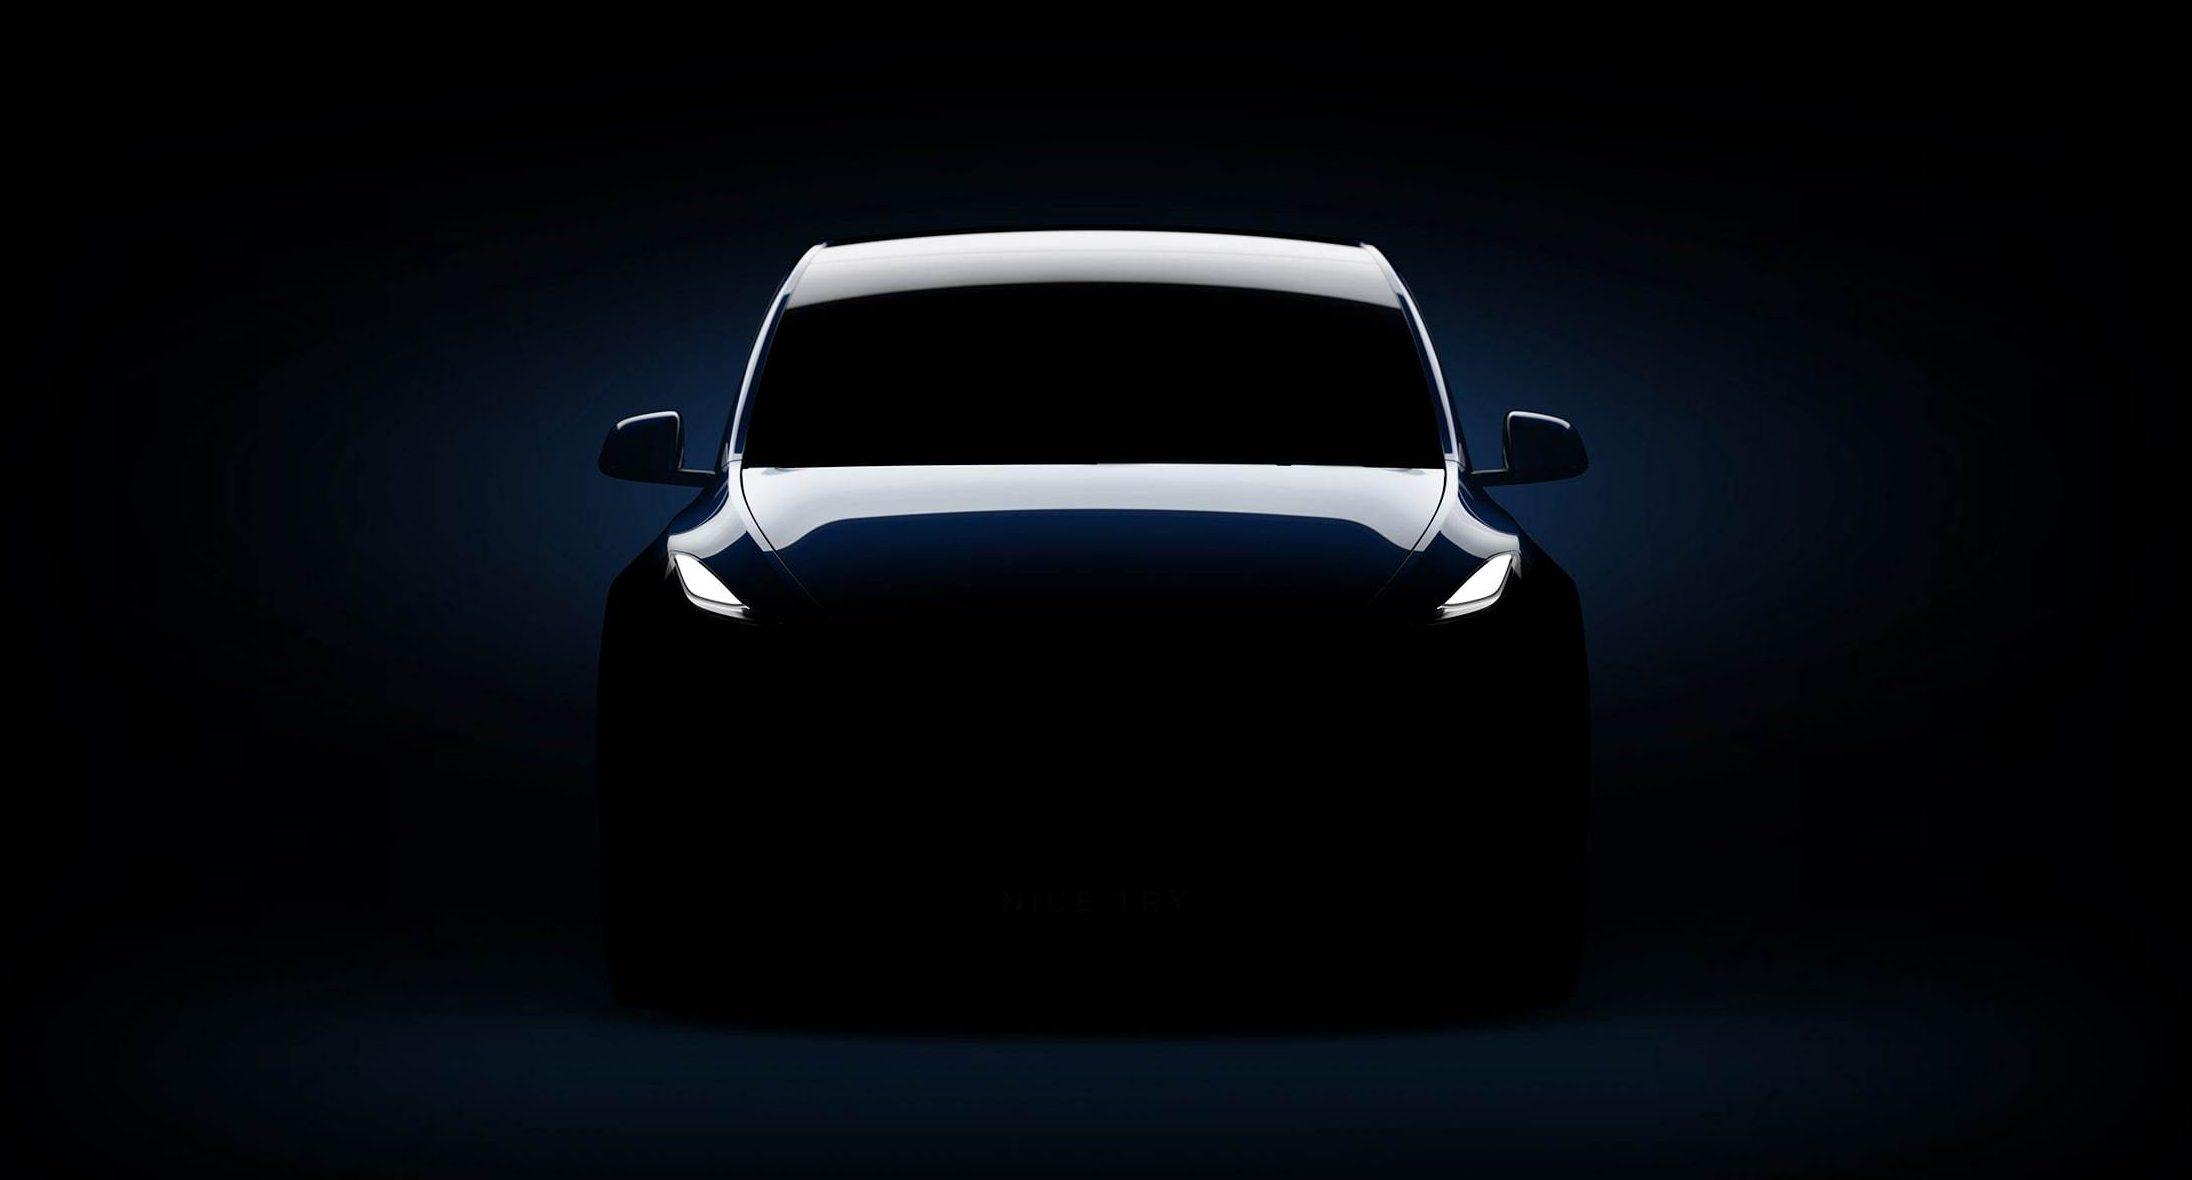 Tesla's Model Y will electrify the SUV market — Quartz